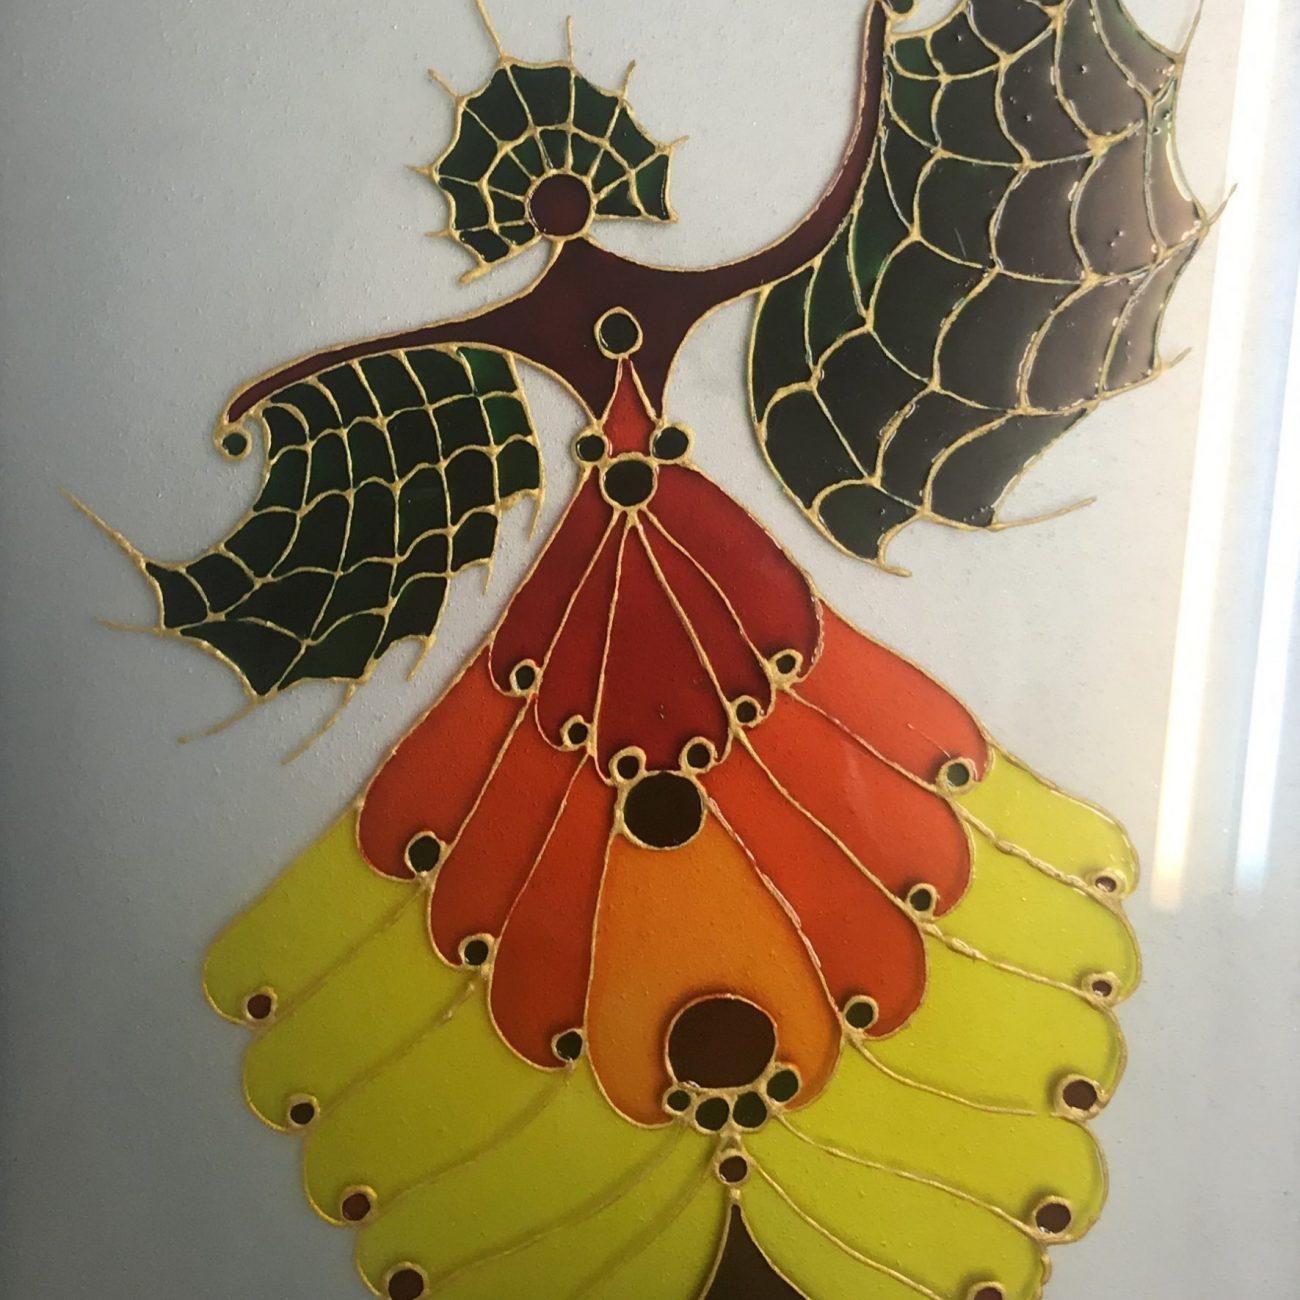 A. Rıza Özkale Teknik : Boyama Vitray Ölçü :19 x 27 cm  Fiyat 472 TL